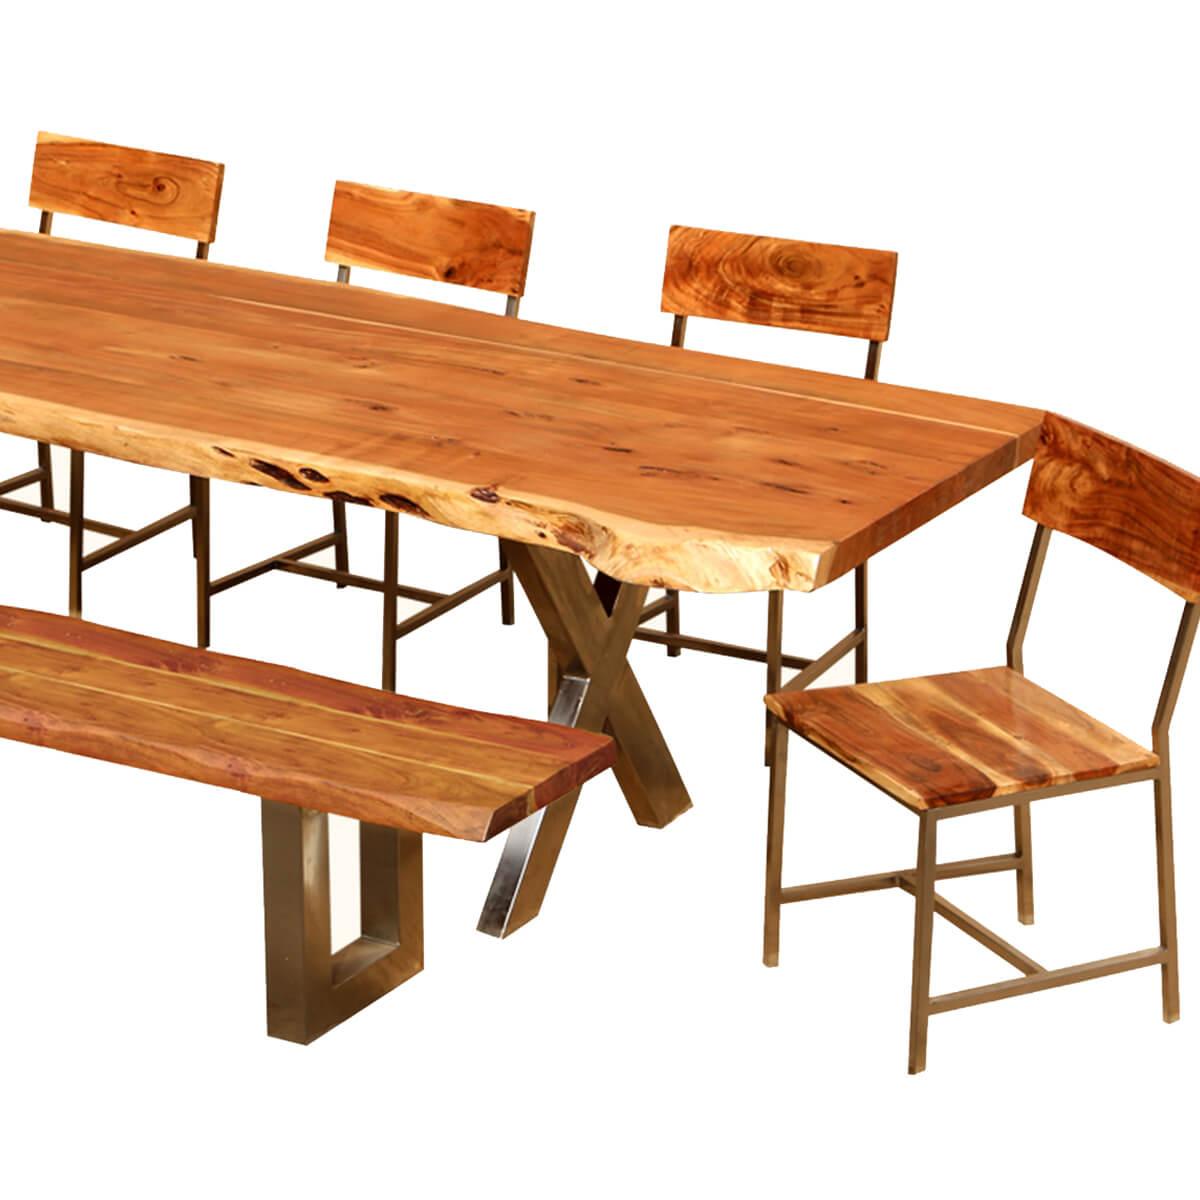 ... Live Edge Acacia Wood U0026 Iron 106u201d Dining Table W 5 Chairs U0026 Bench ...